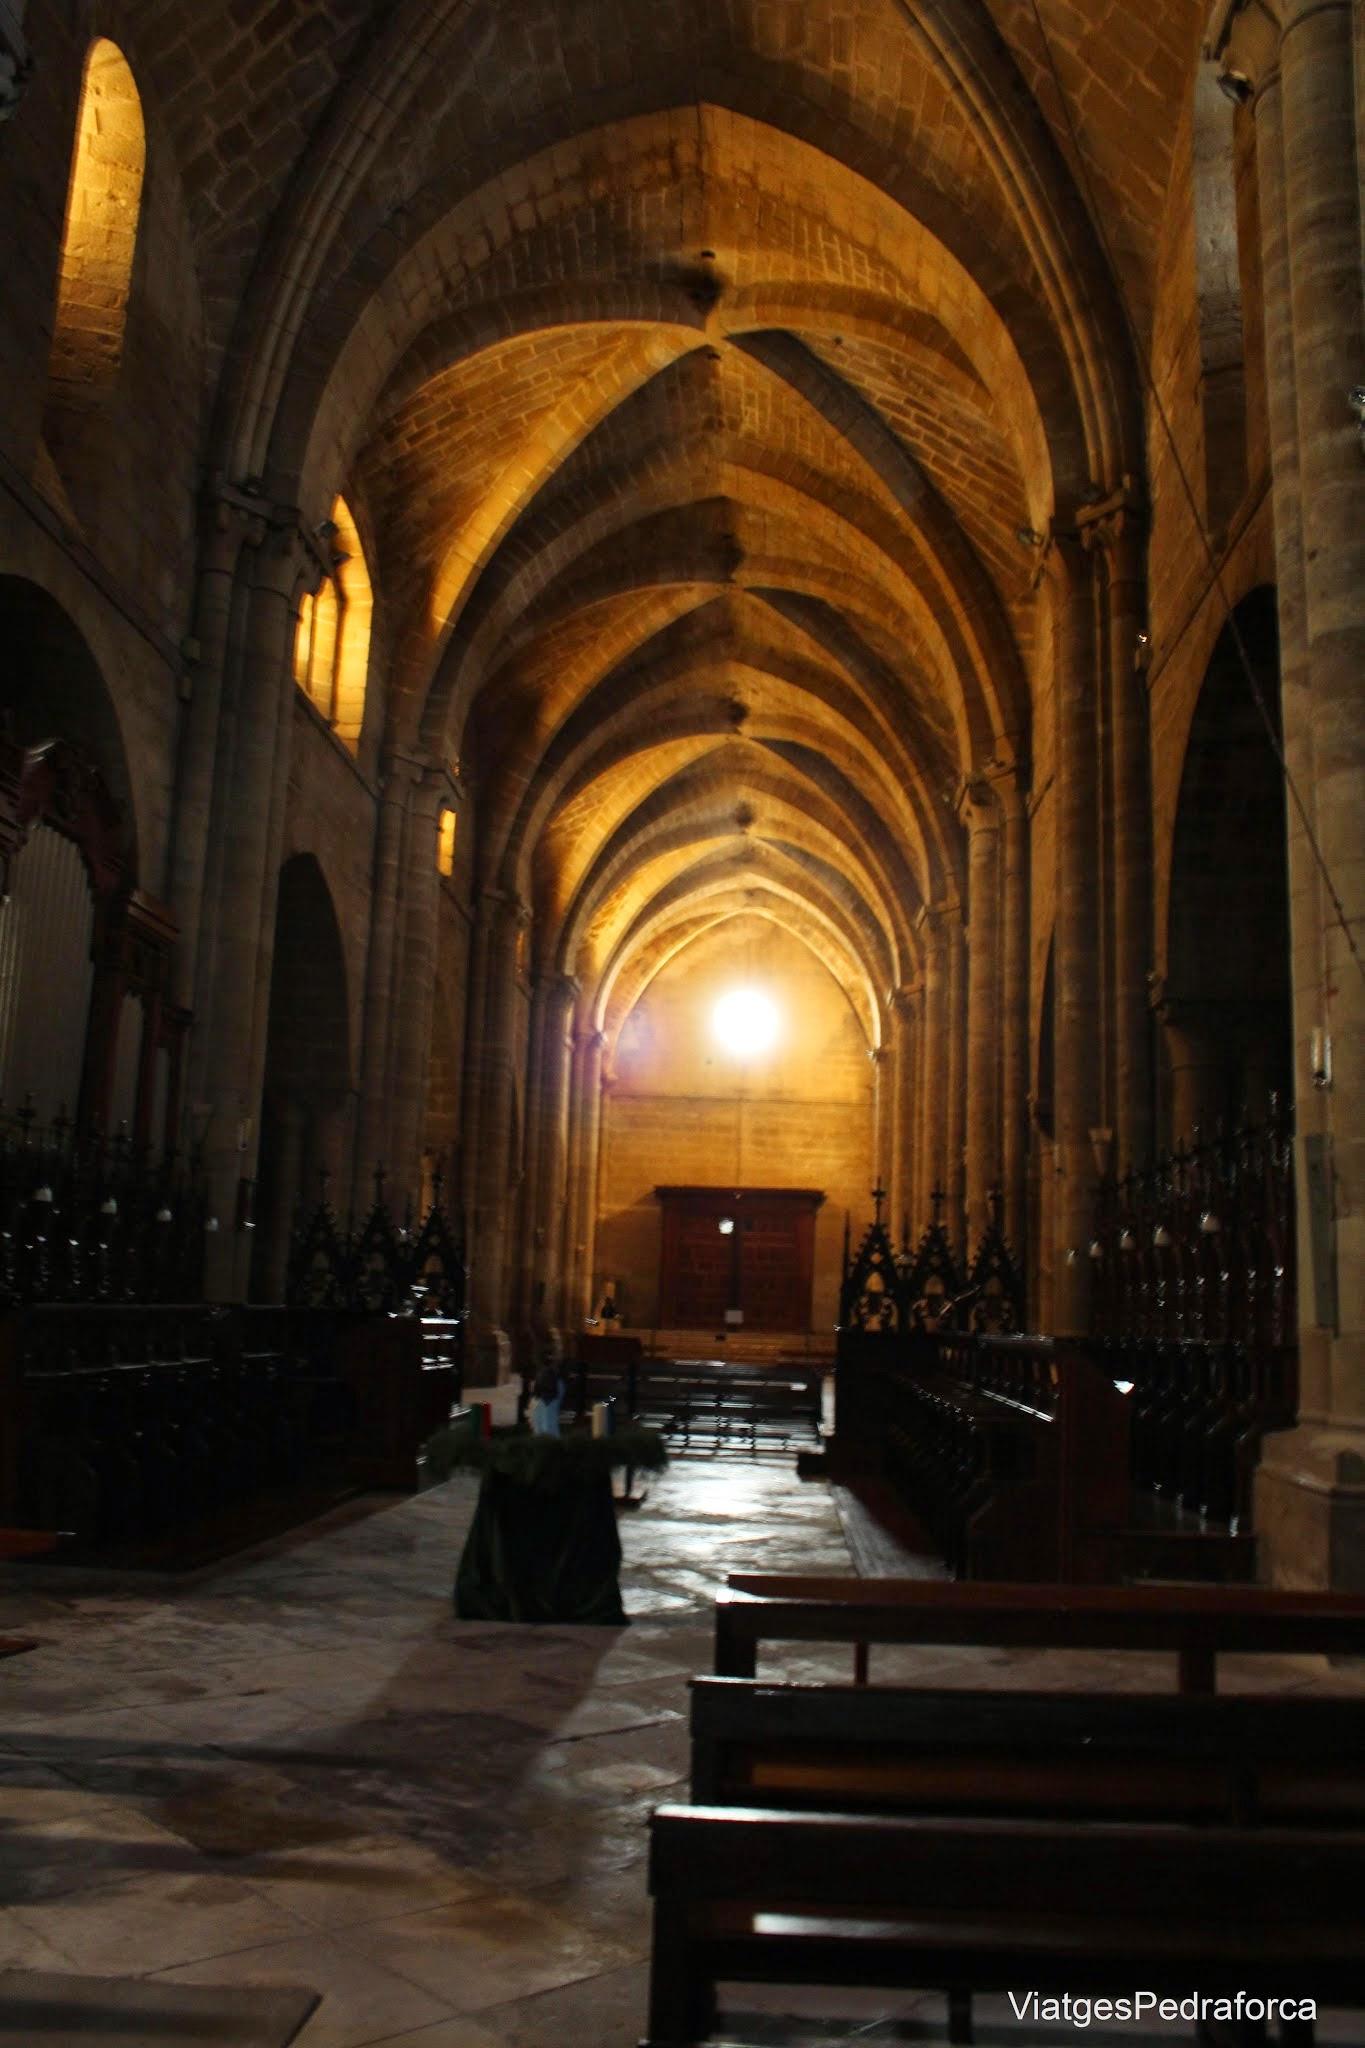 Nave central de la iglesia del Monasterio cisterciense de la Oliva Navarra